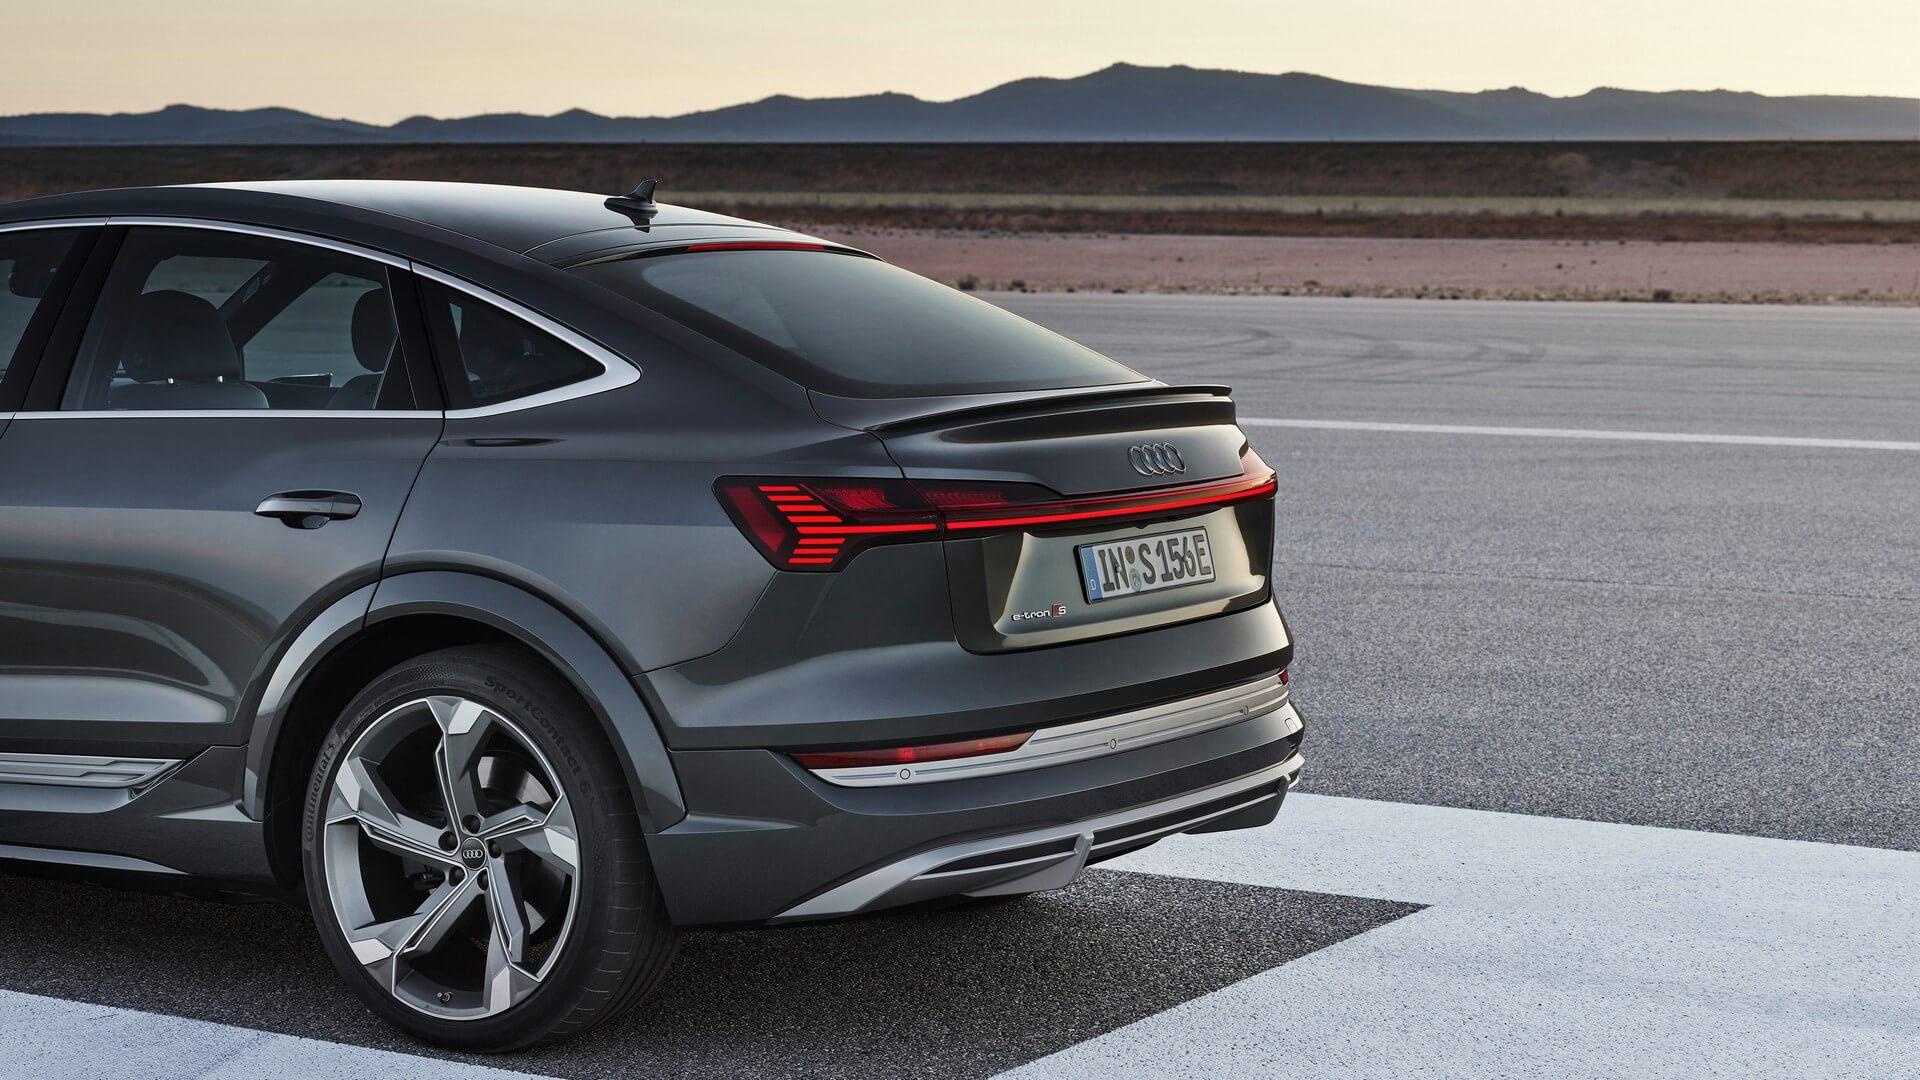 Audi-E-Tron-S-and-E-Tron-S-Sportback-2020-80